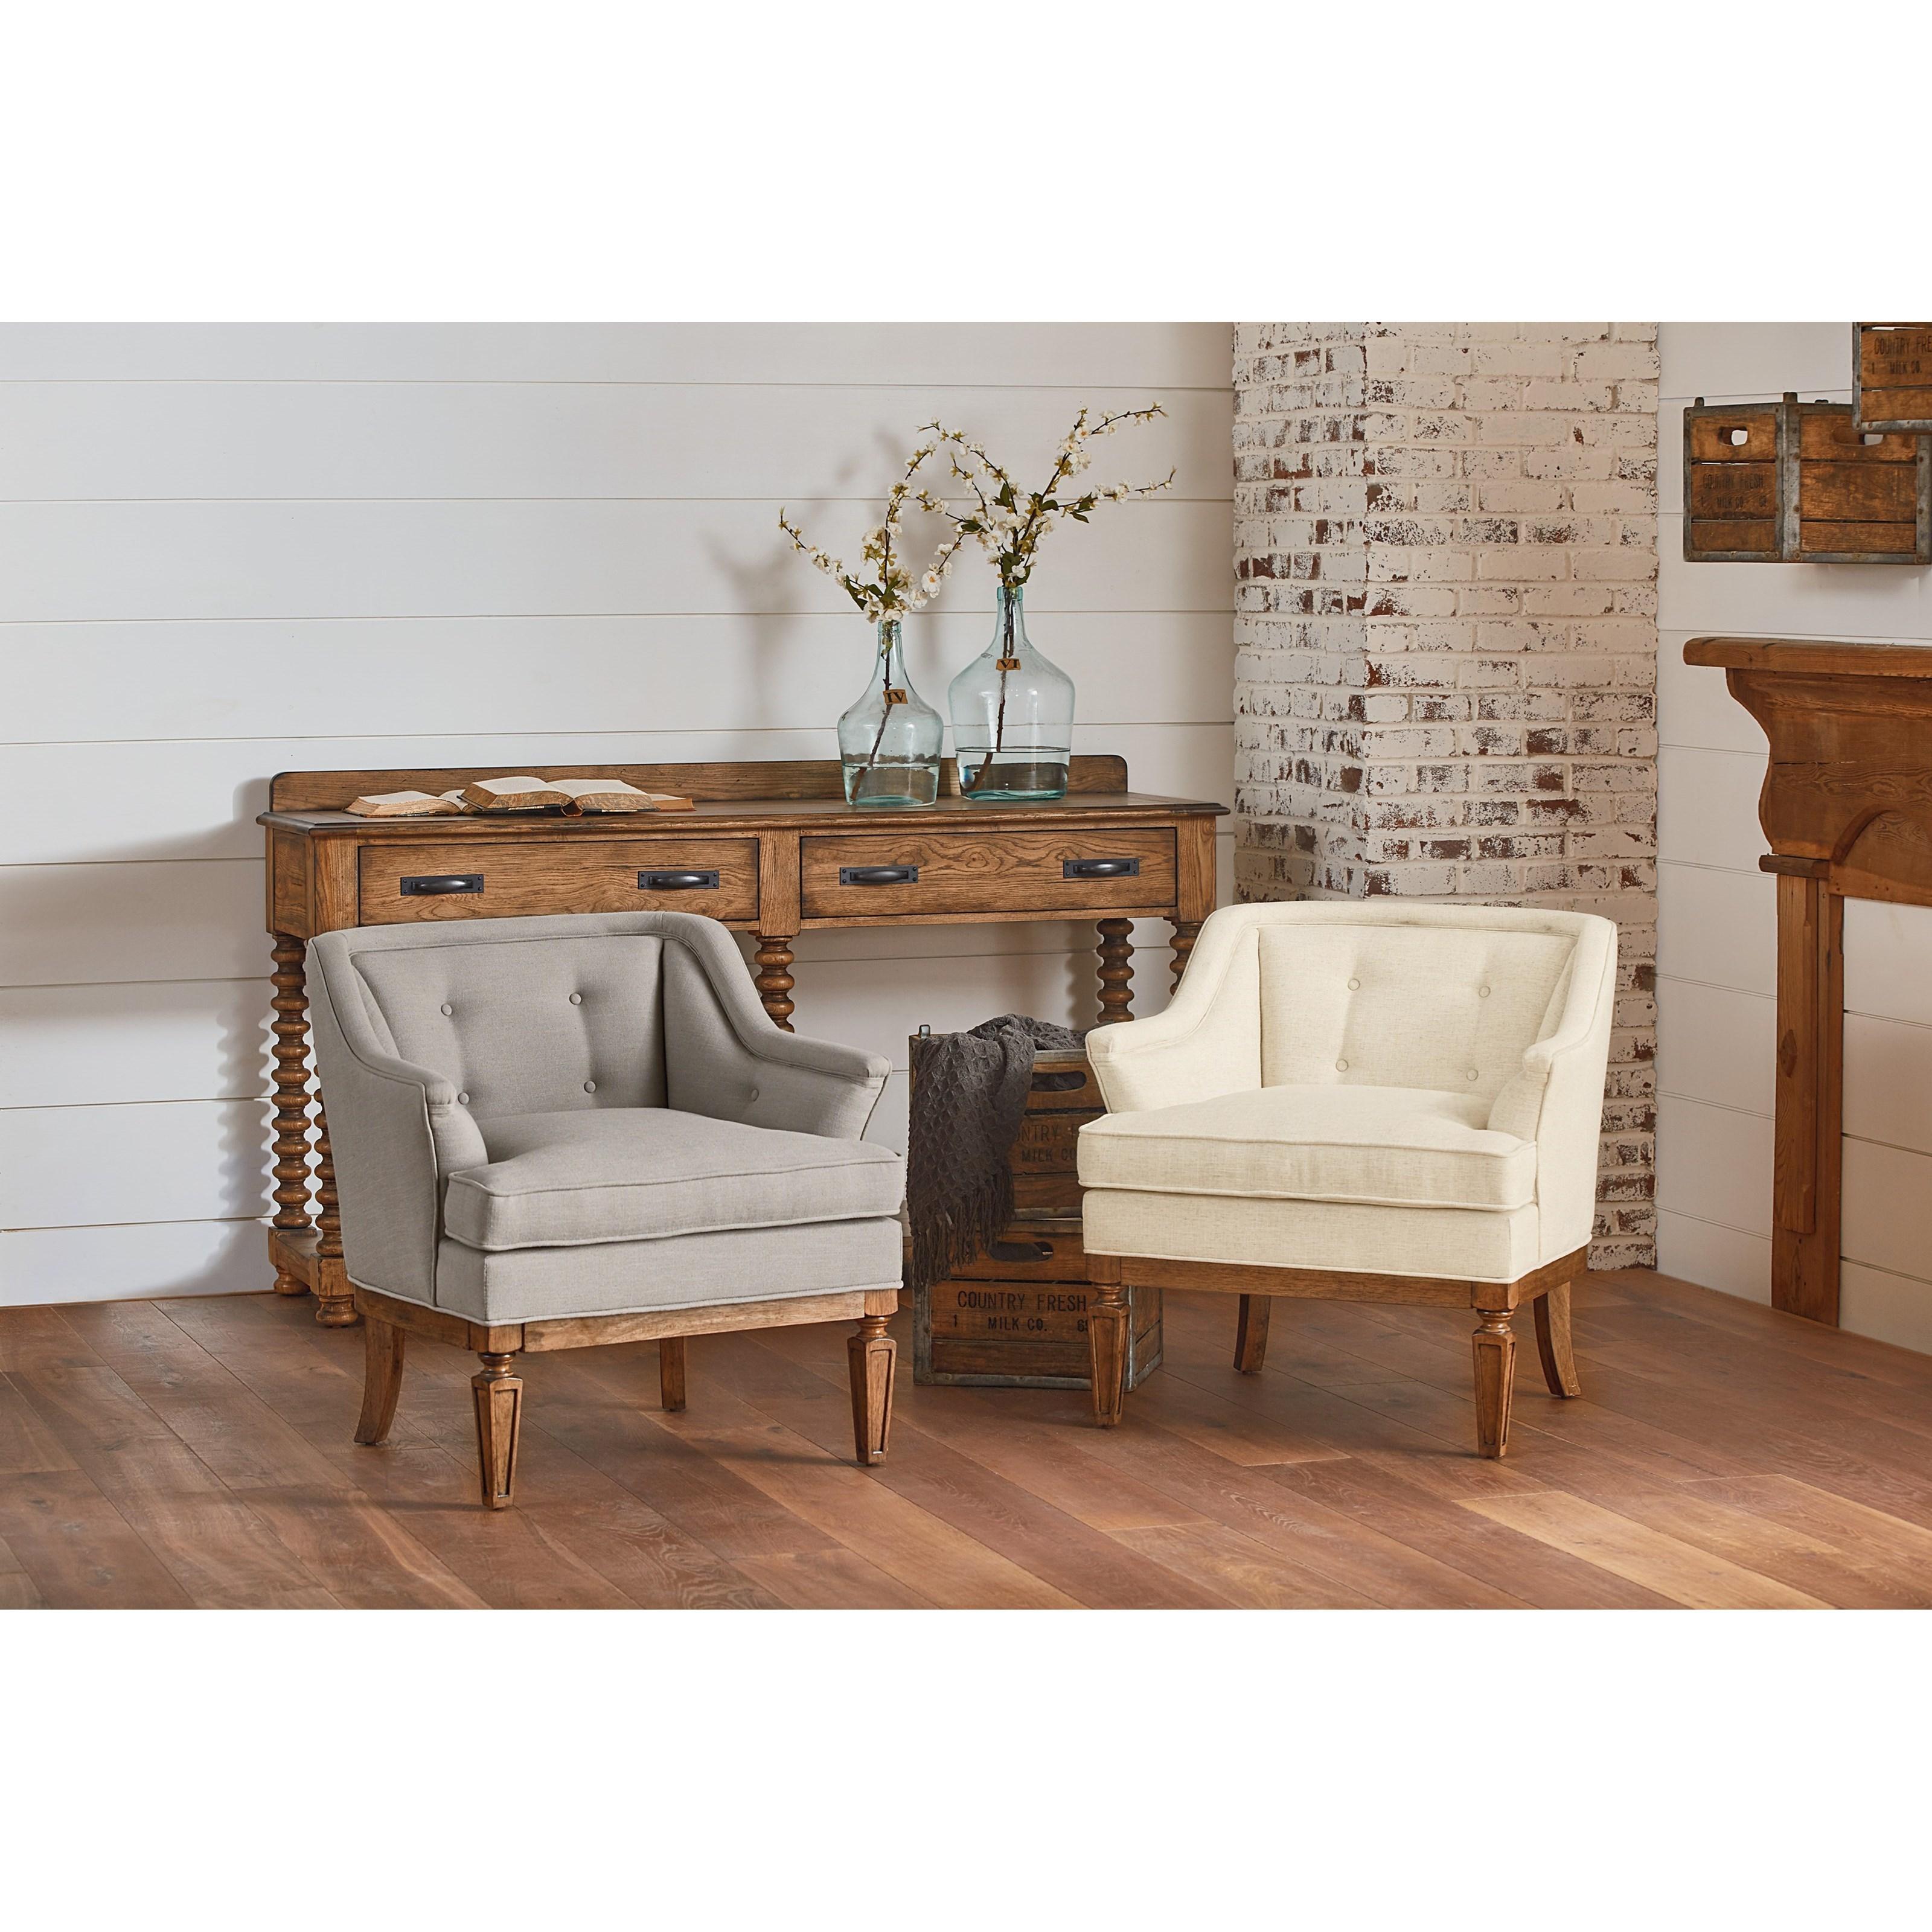 cotillion upholstered tub shaped chairmagnolia homejoanna